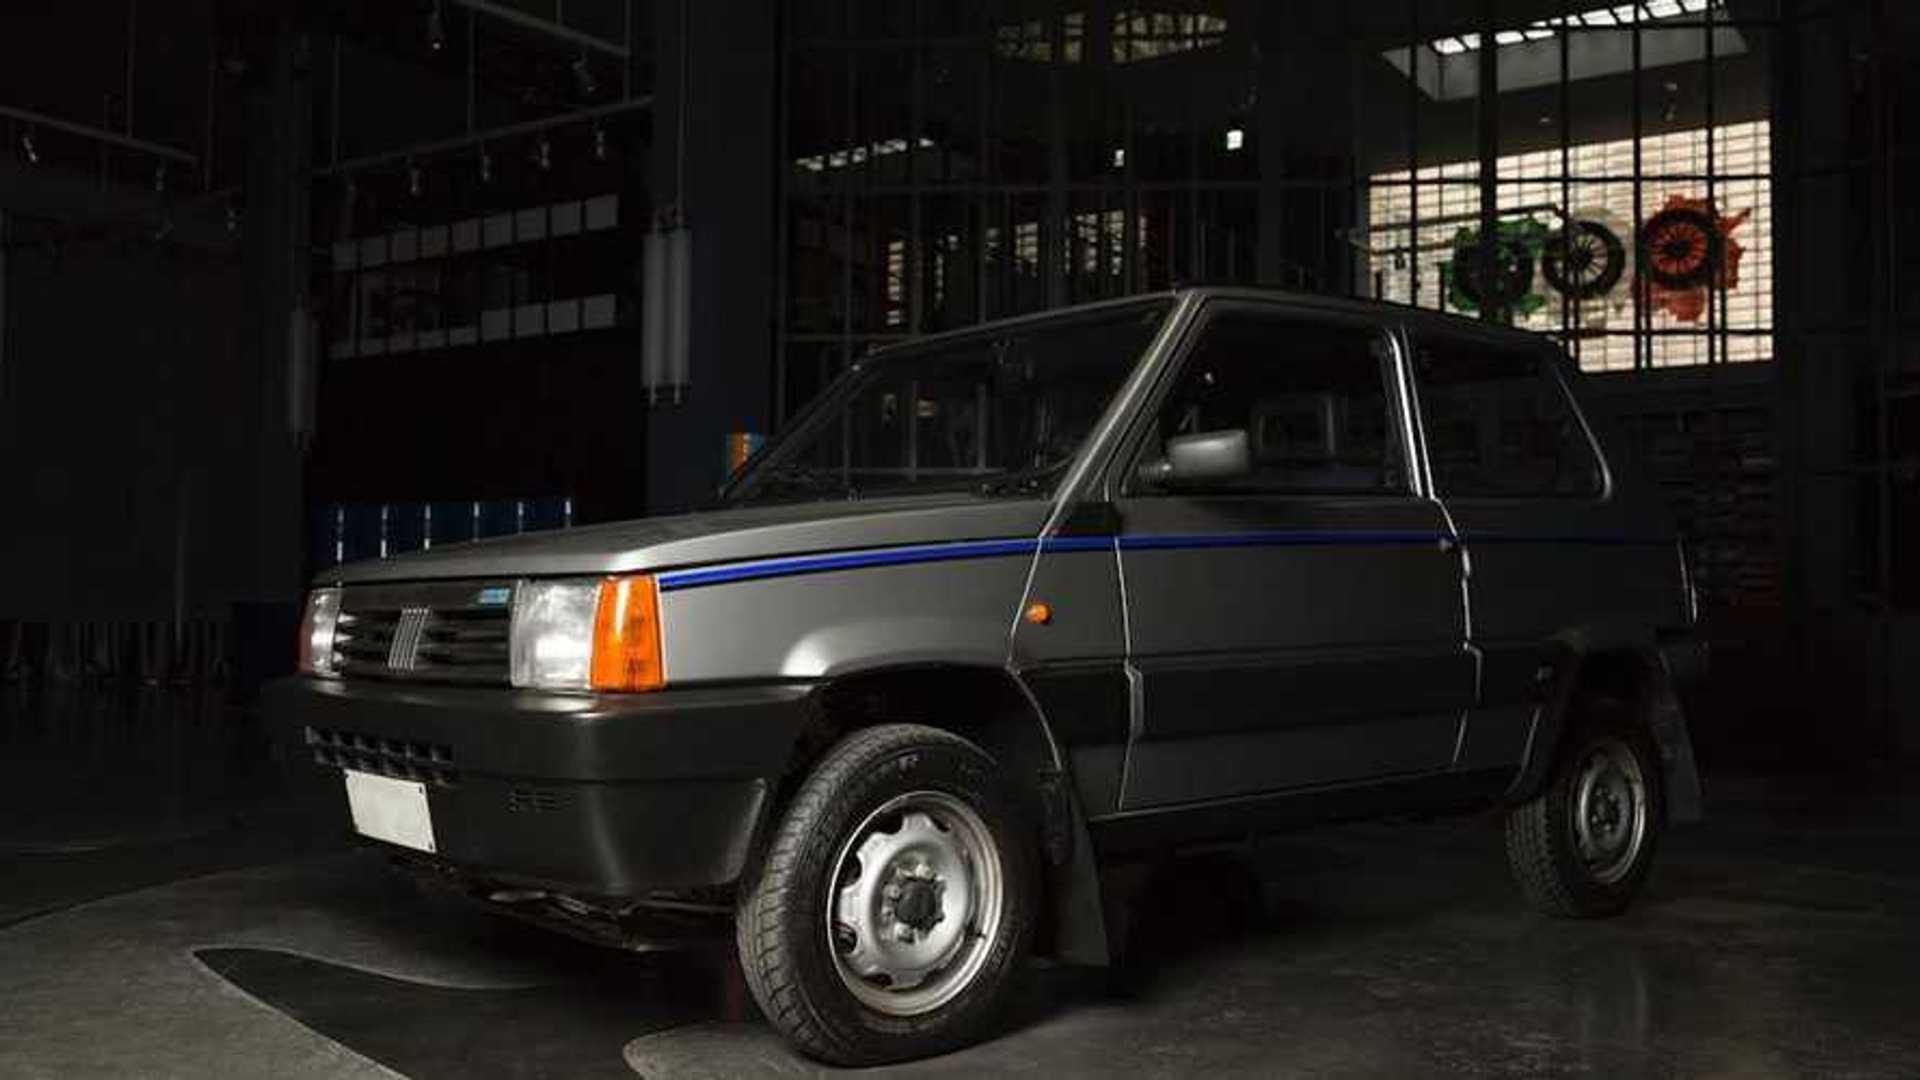 Fiat Panda 4x4 Restored Better Than New